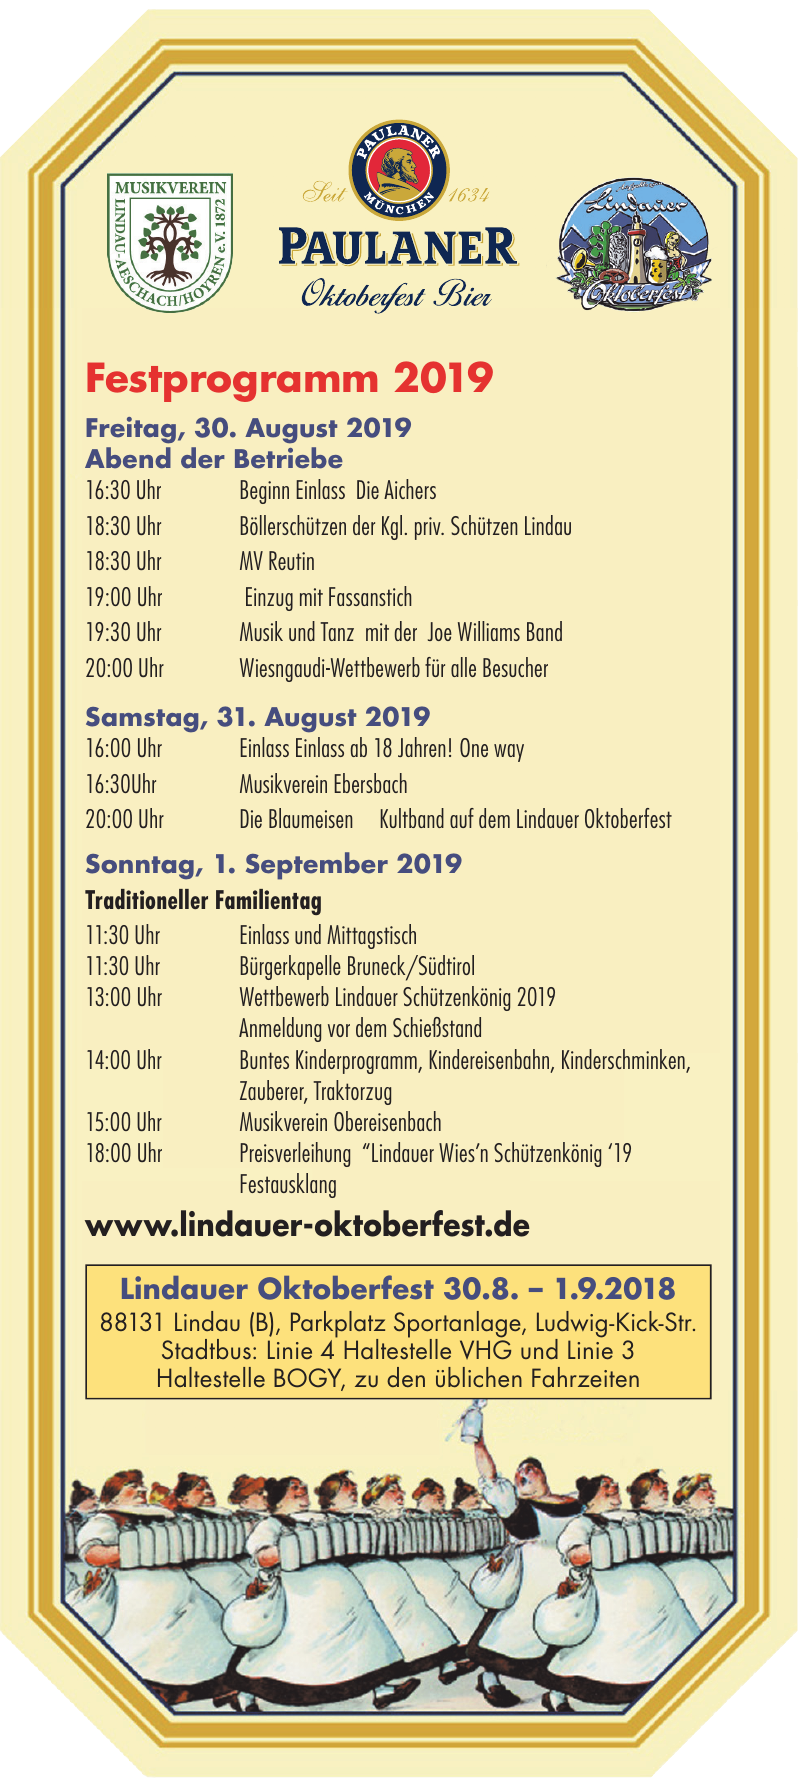 Lindauer Oktoberfest